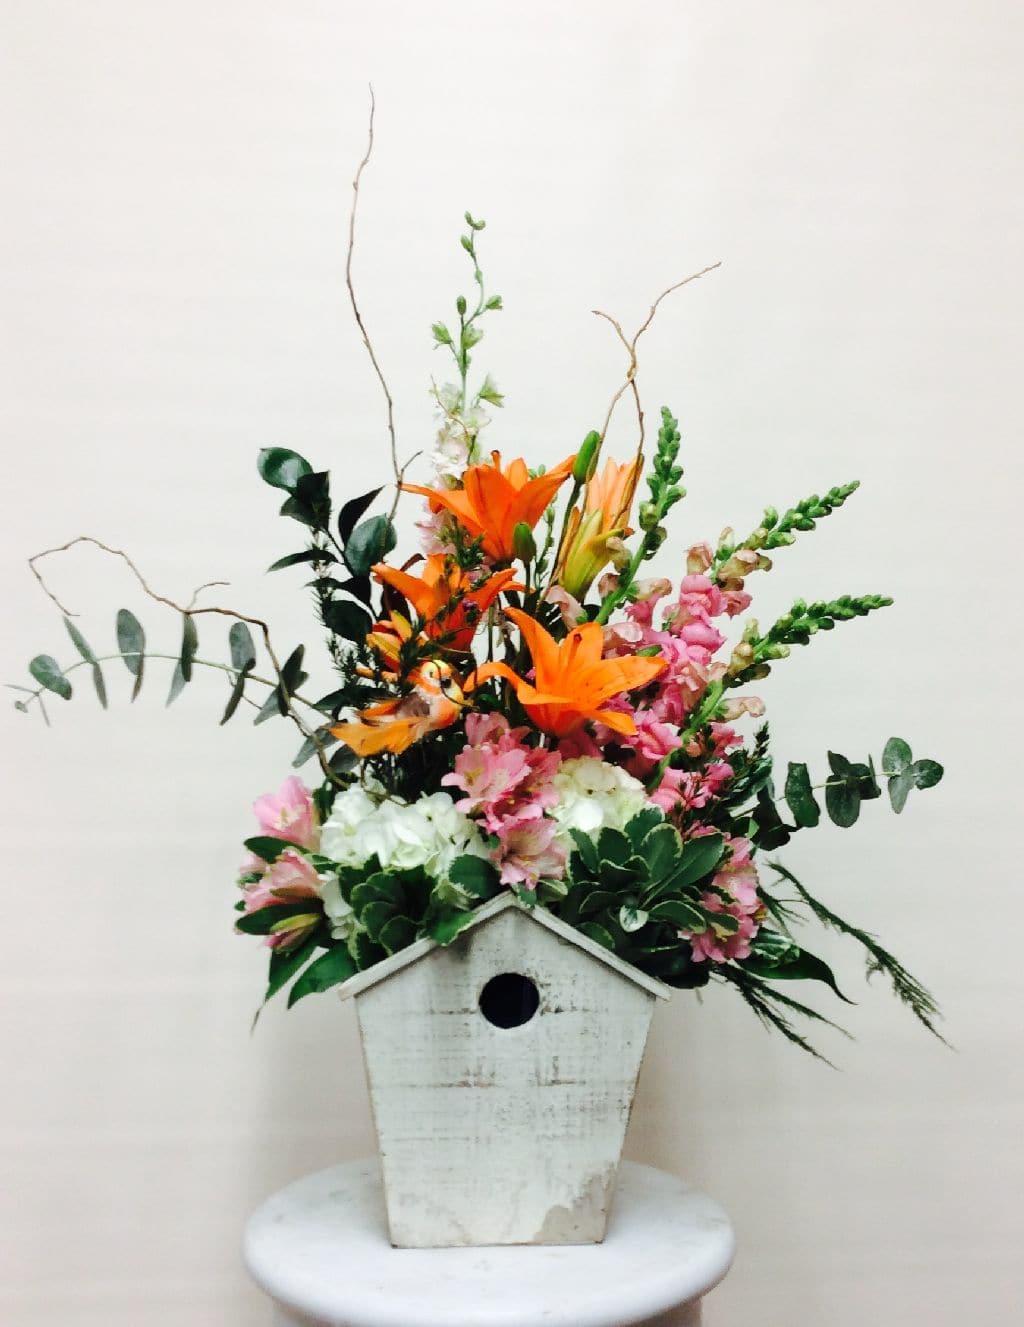 Bird House Delight Bouquet